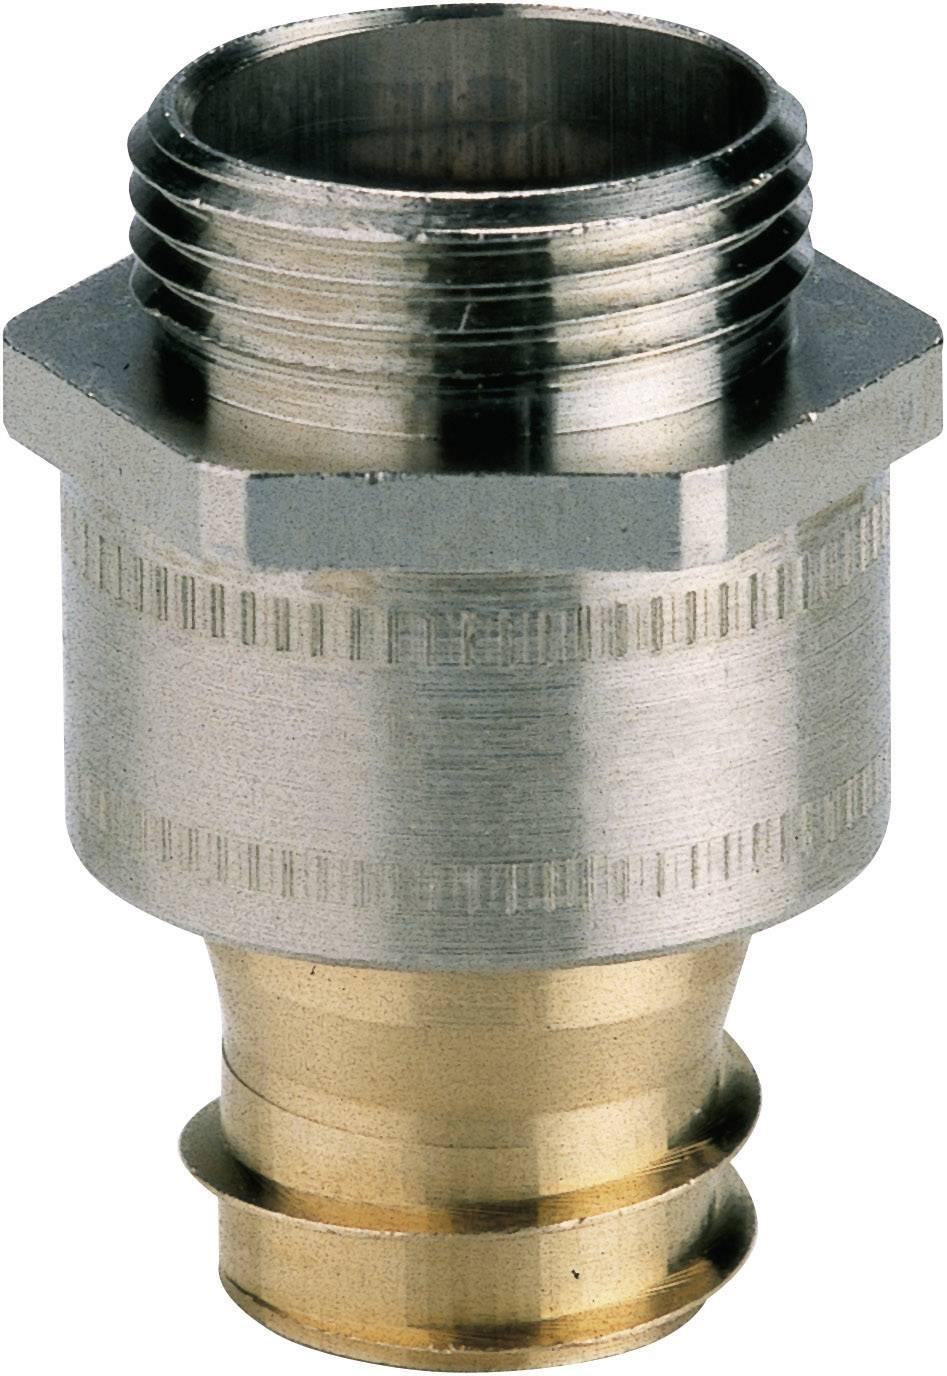 Hadicová spojka rovná LAPP SILVYN® LI-M 40x1,5 SGY 61802375, M40, stříbrná, 1 ks